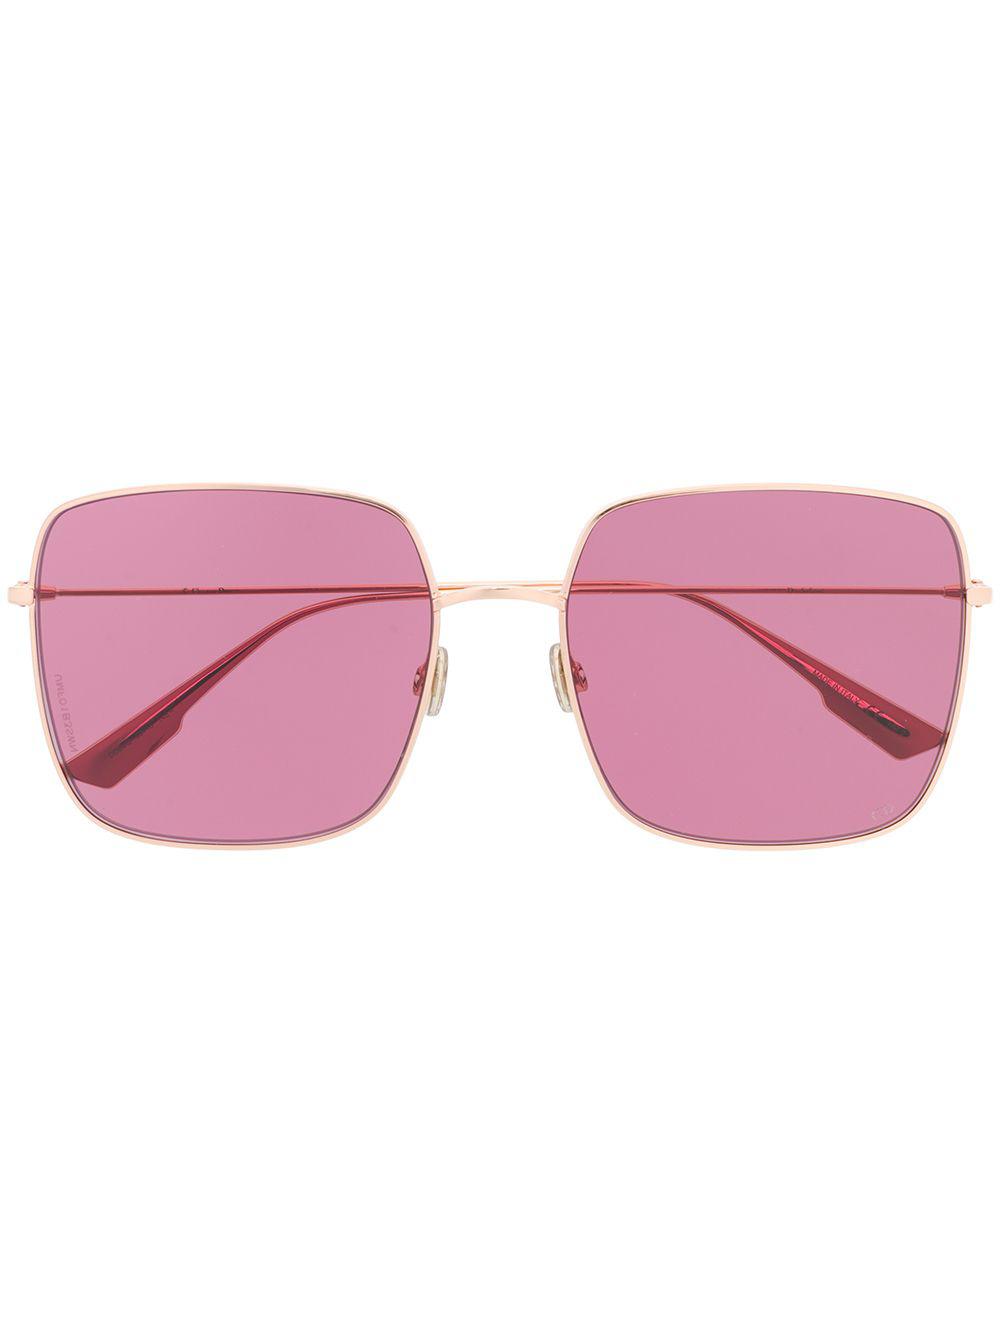 24c10d6bb6 Dior Eyewear Stellaire Sunglasses - Gold